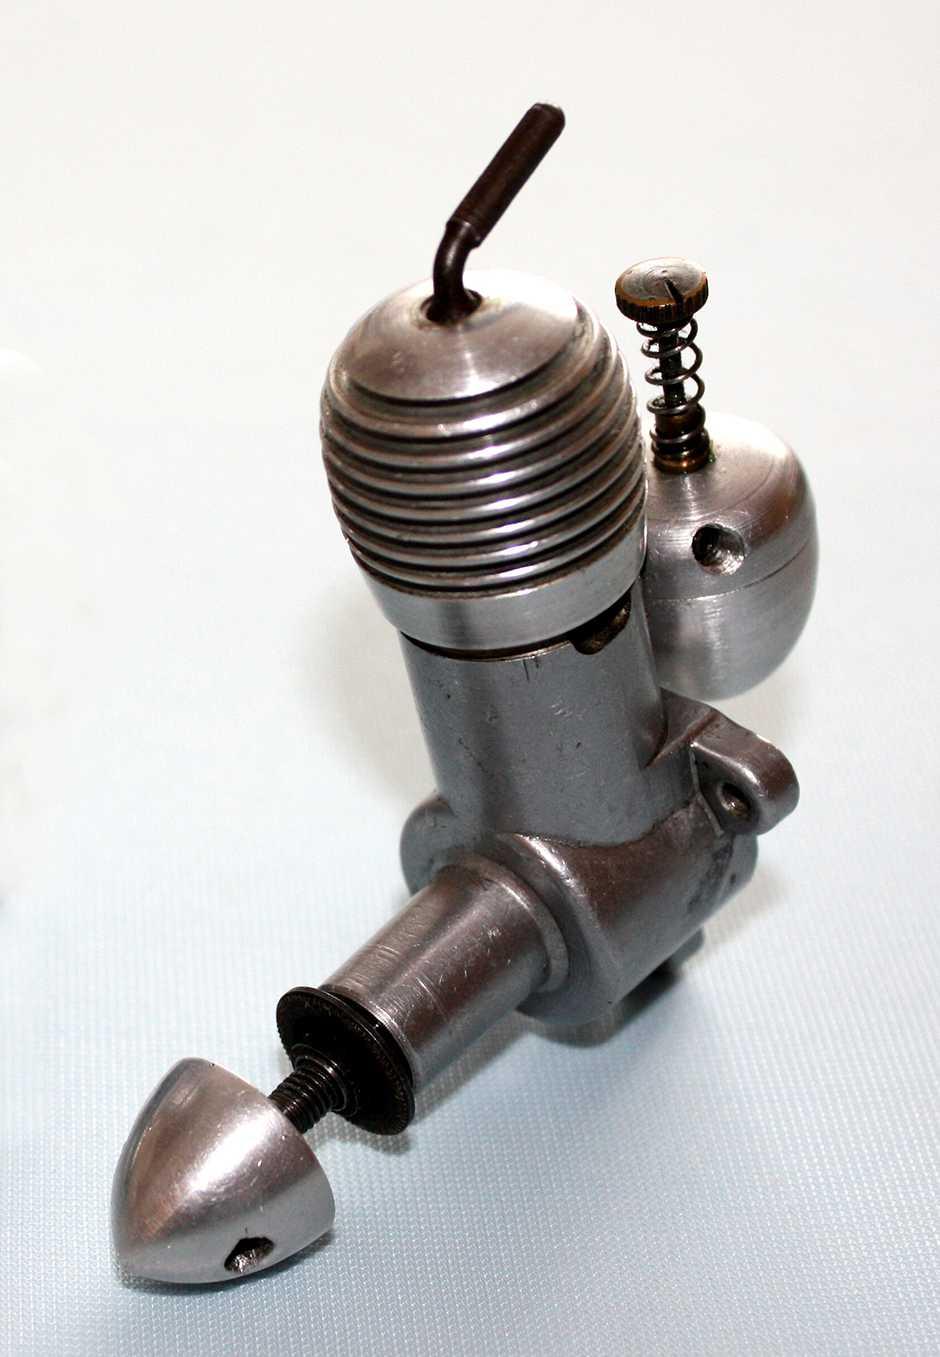 Foto č. 7 - Originál motoru SUPER ATOM z roku 1946